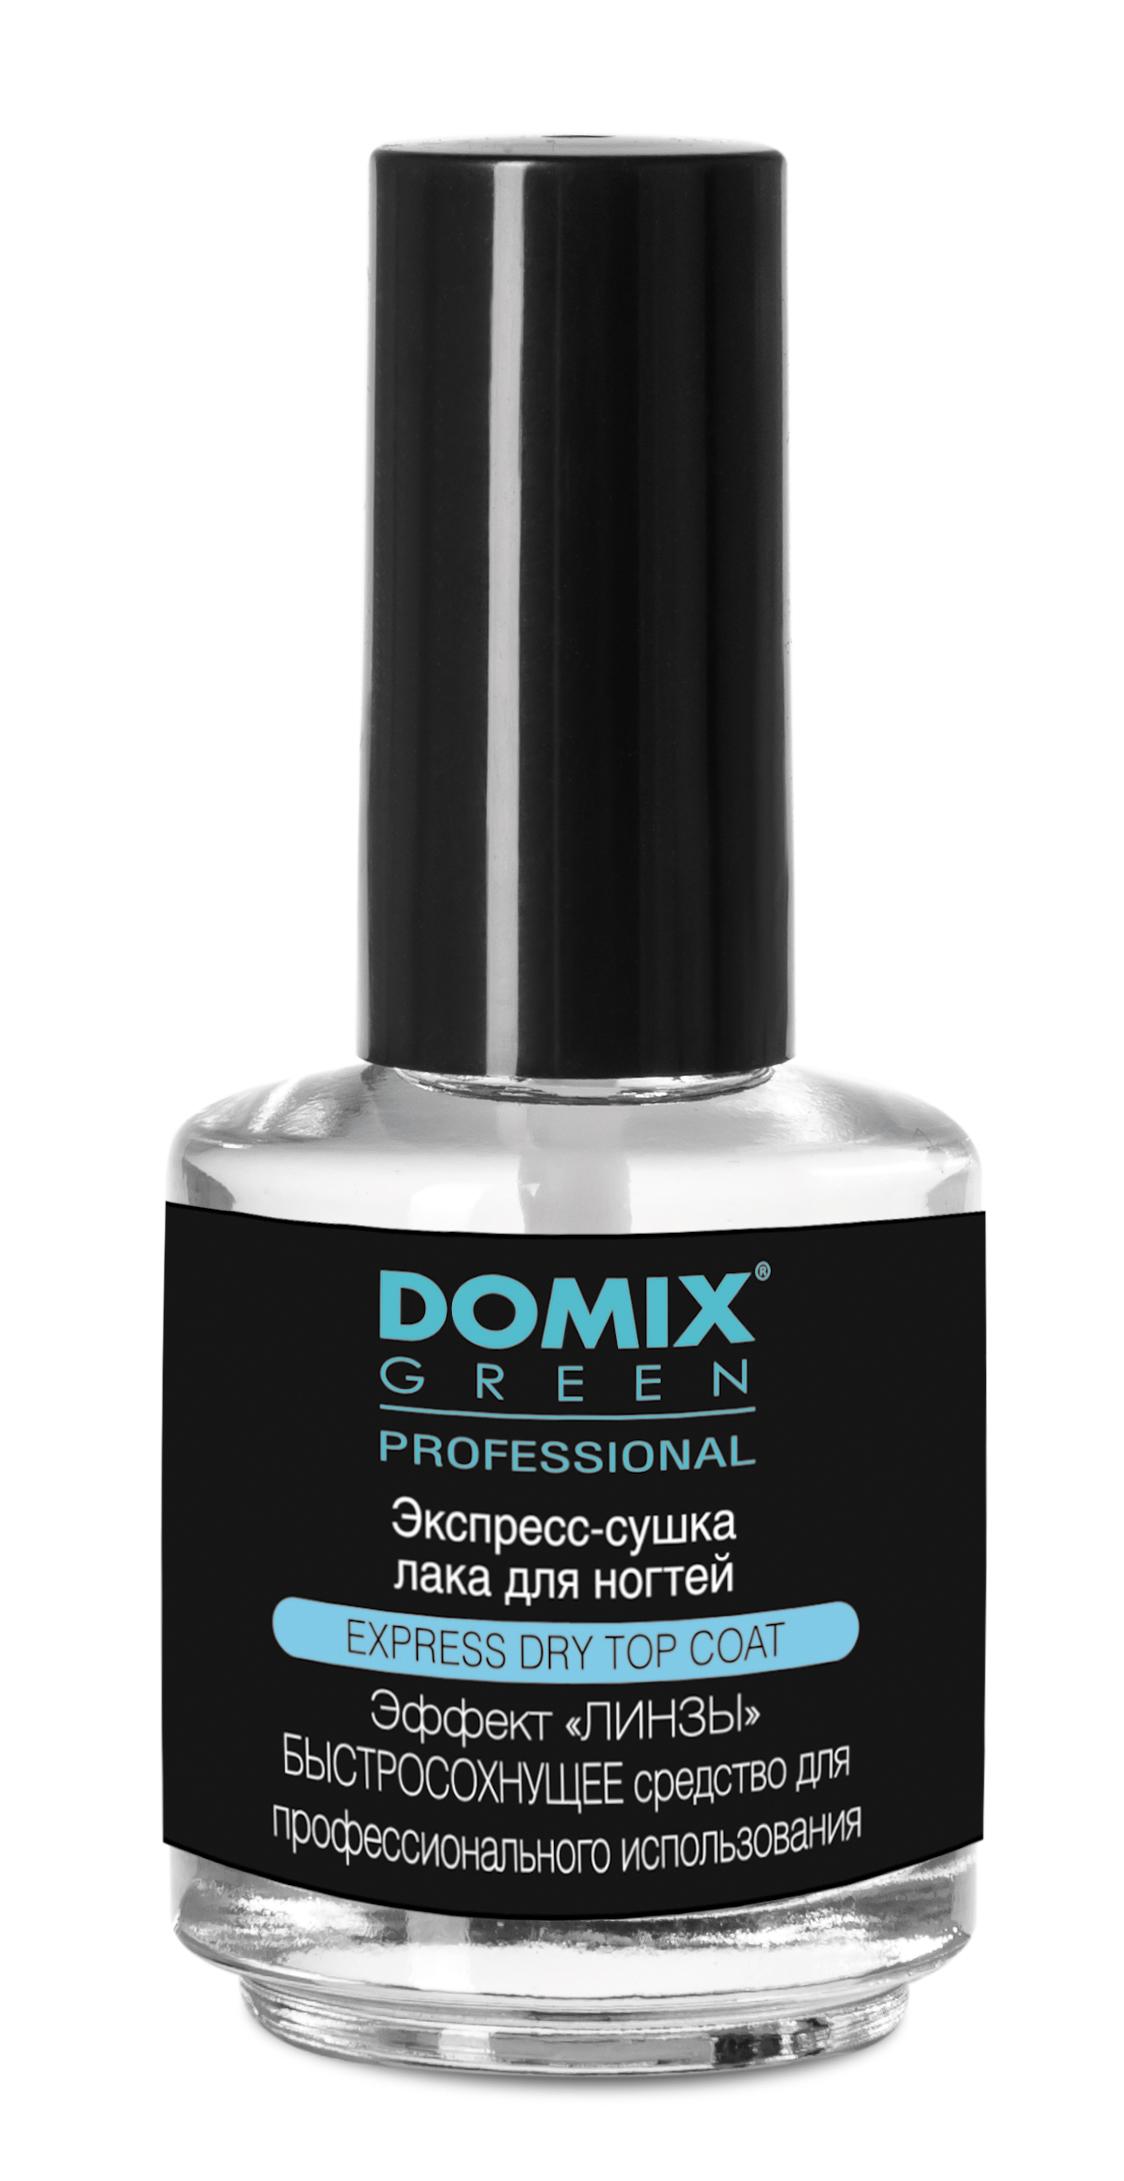 DOMIX GREEN PROFESSIONAL Экспресс-сушка лака для ногтей / DGP 17 мл - Сушки